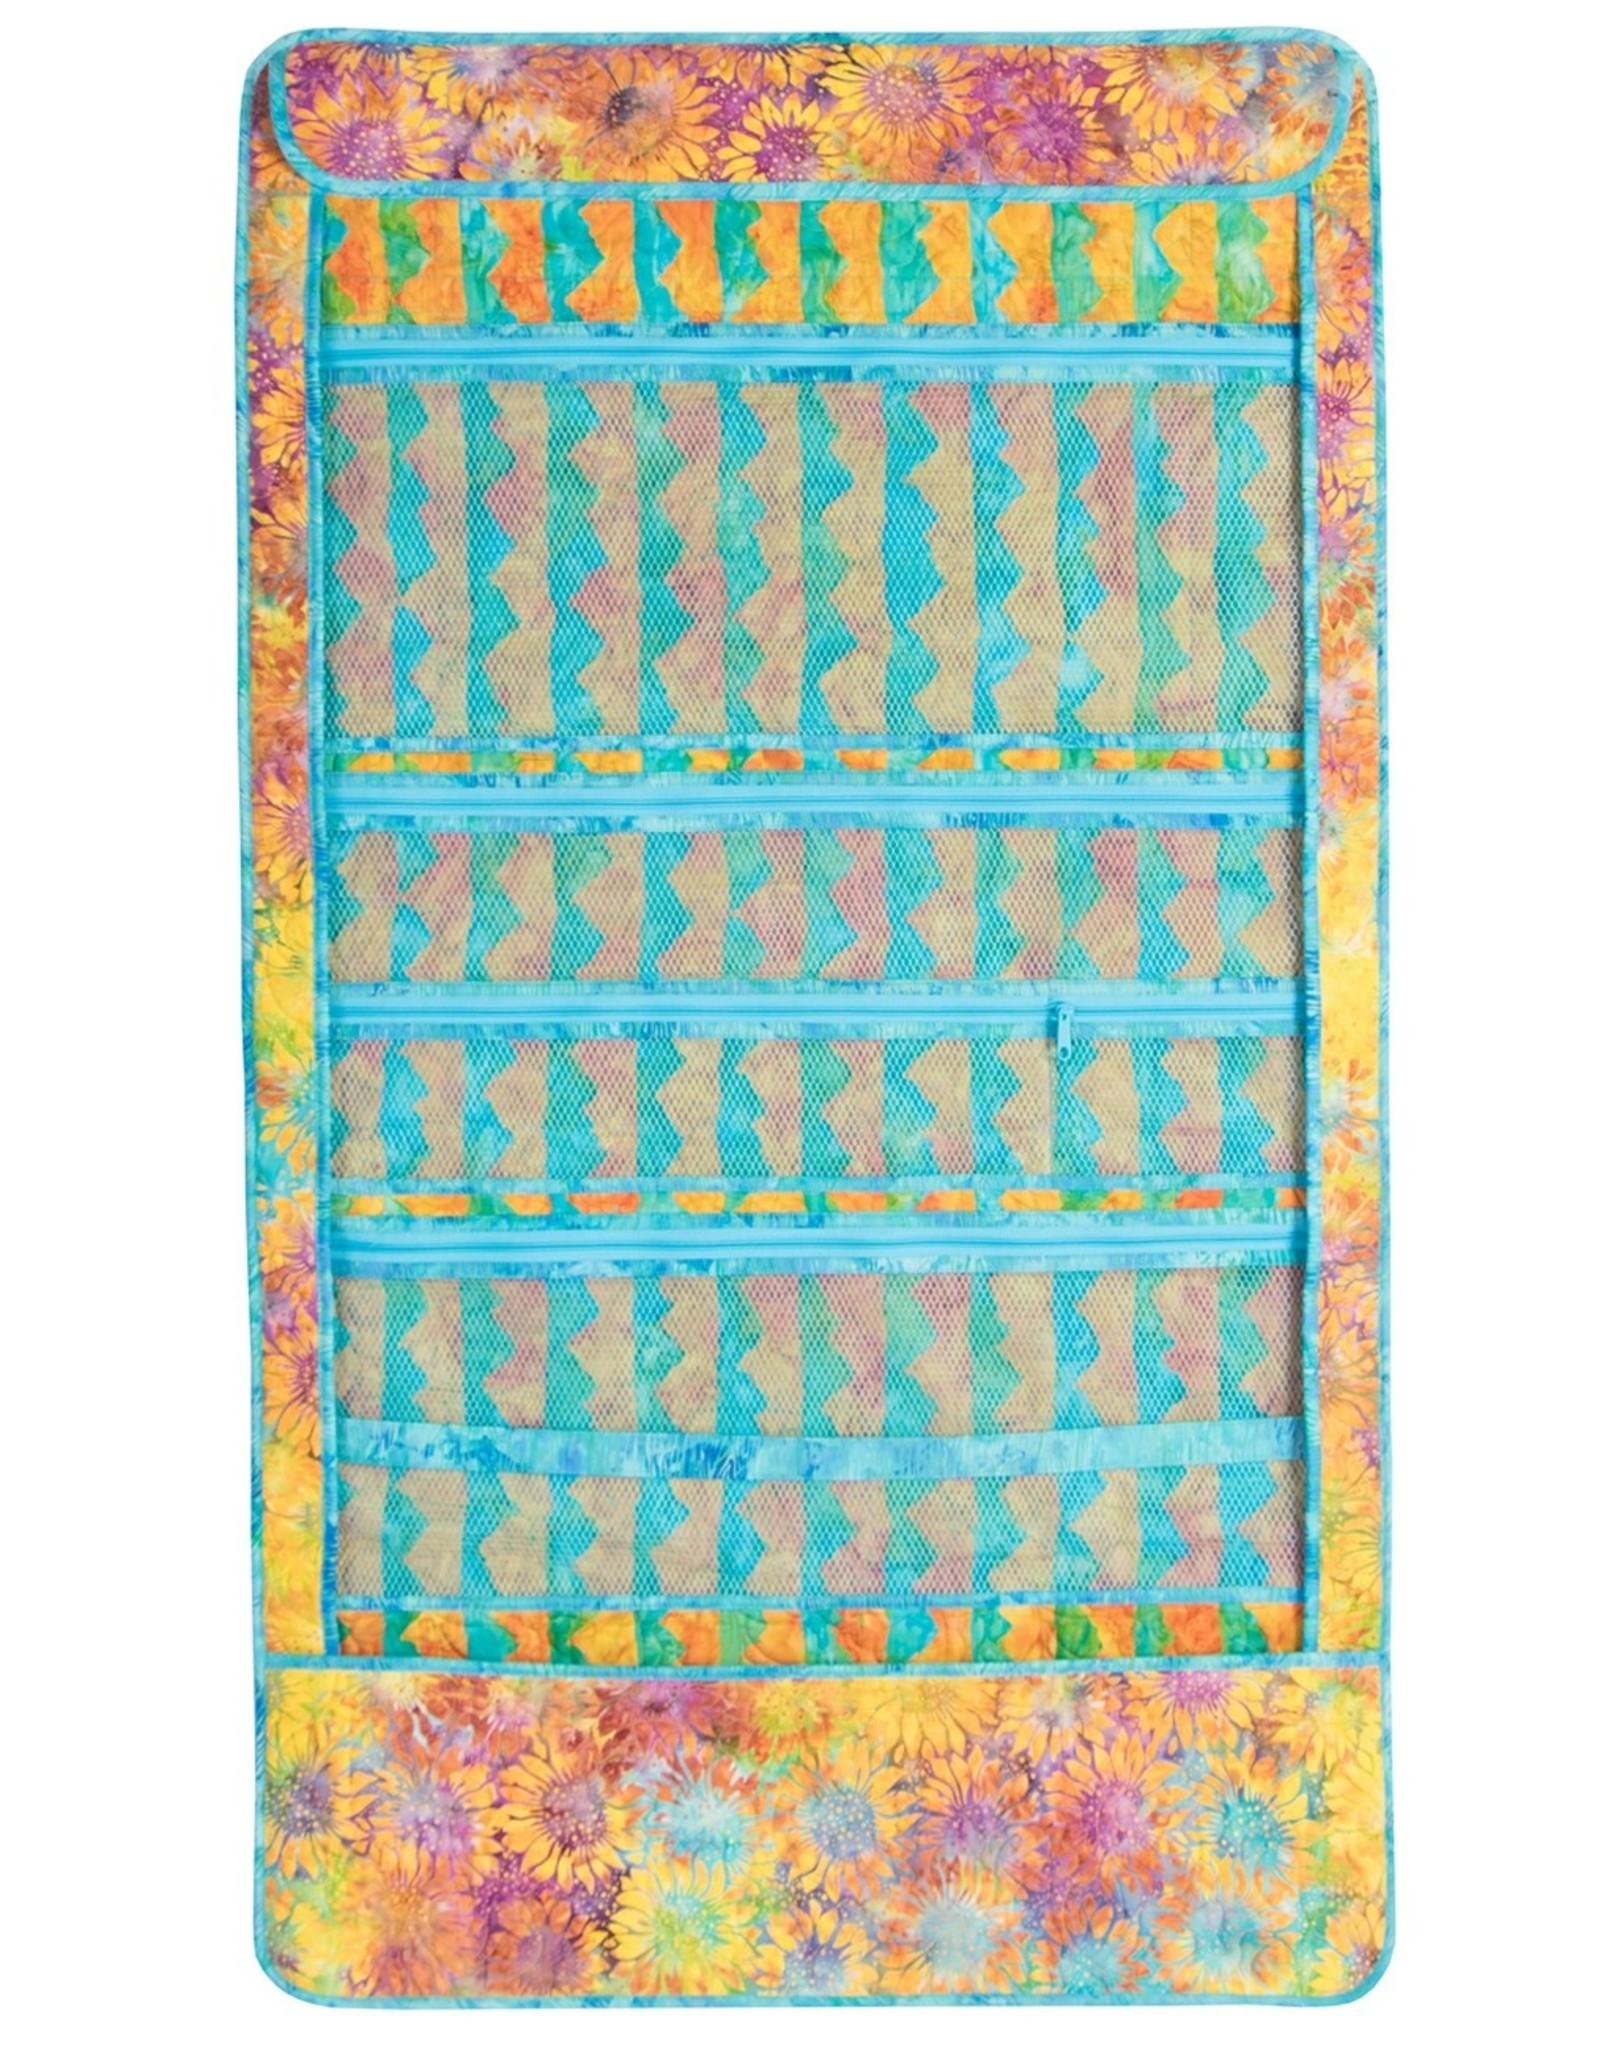 By Annie Ruler Wrap - by Annie